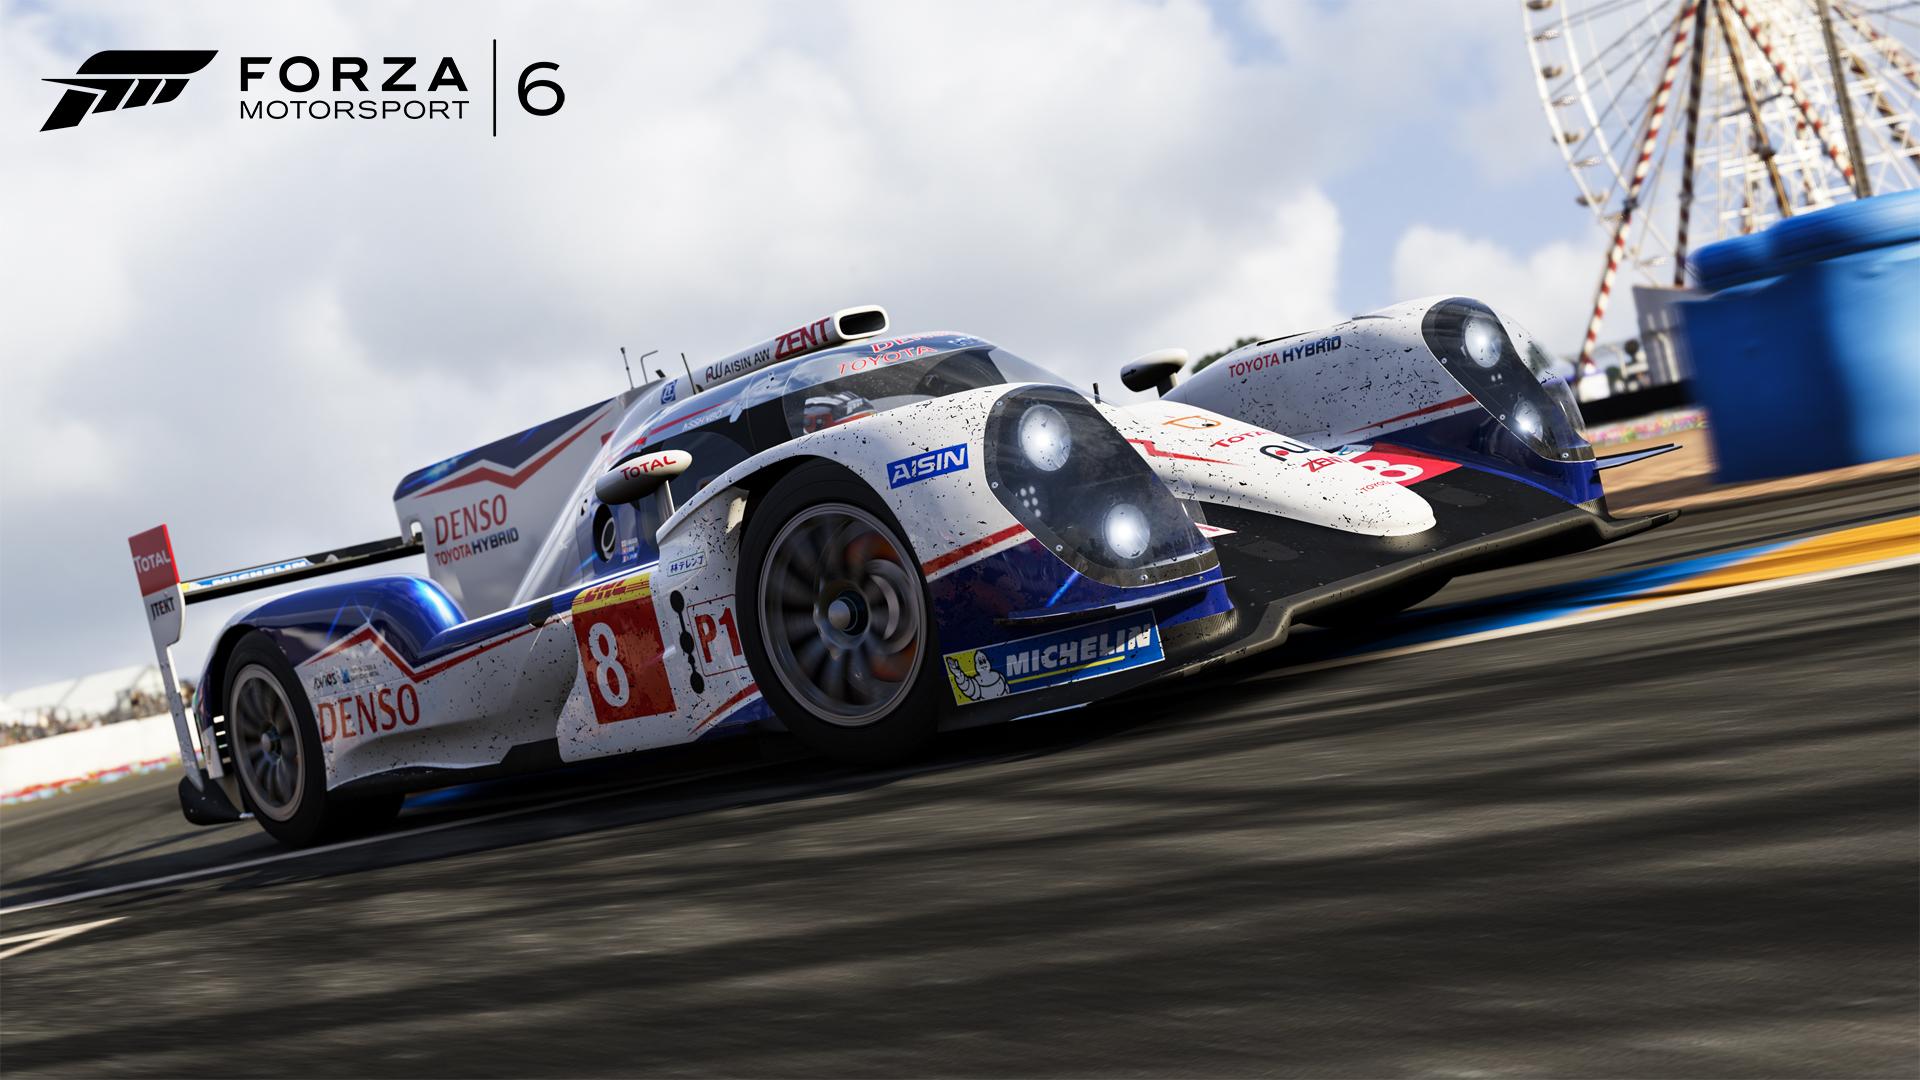 2014 Toyota #8 Toyota Racing TS040 HYBRID